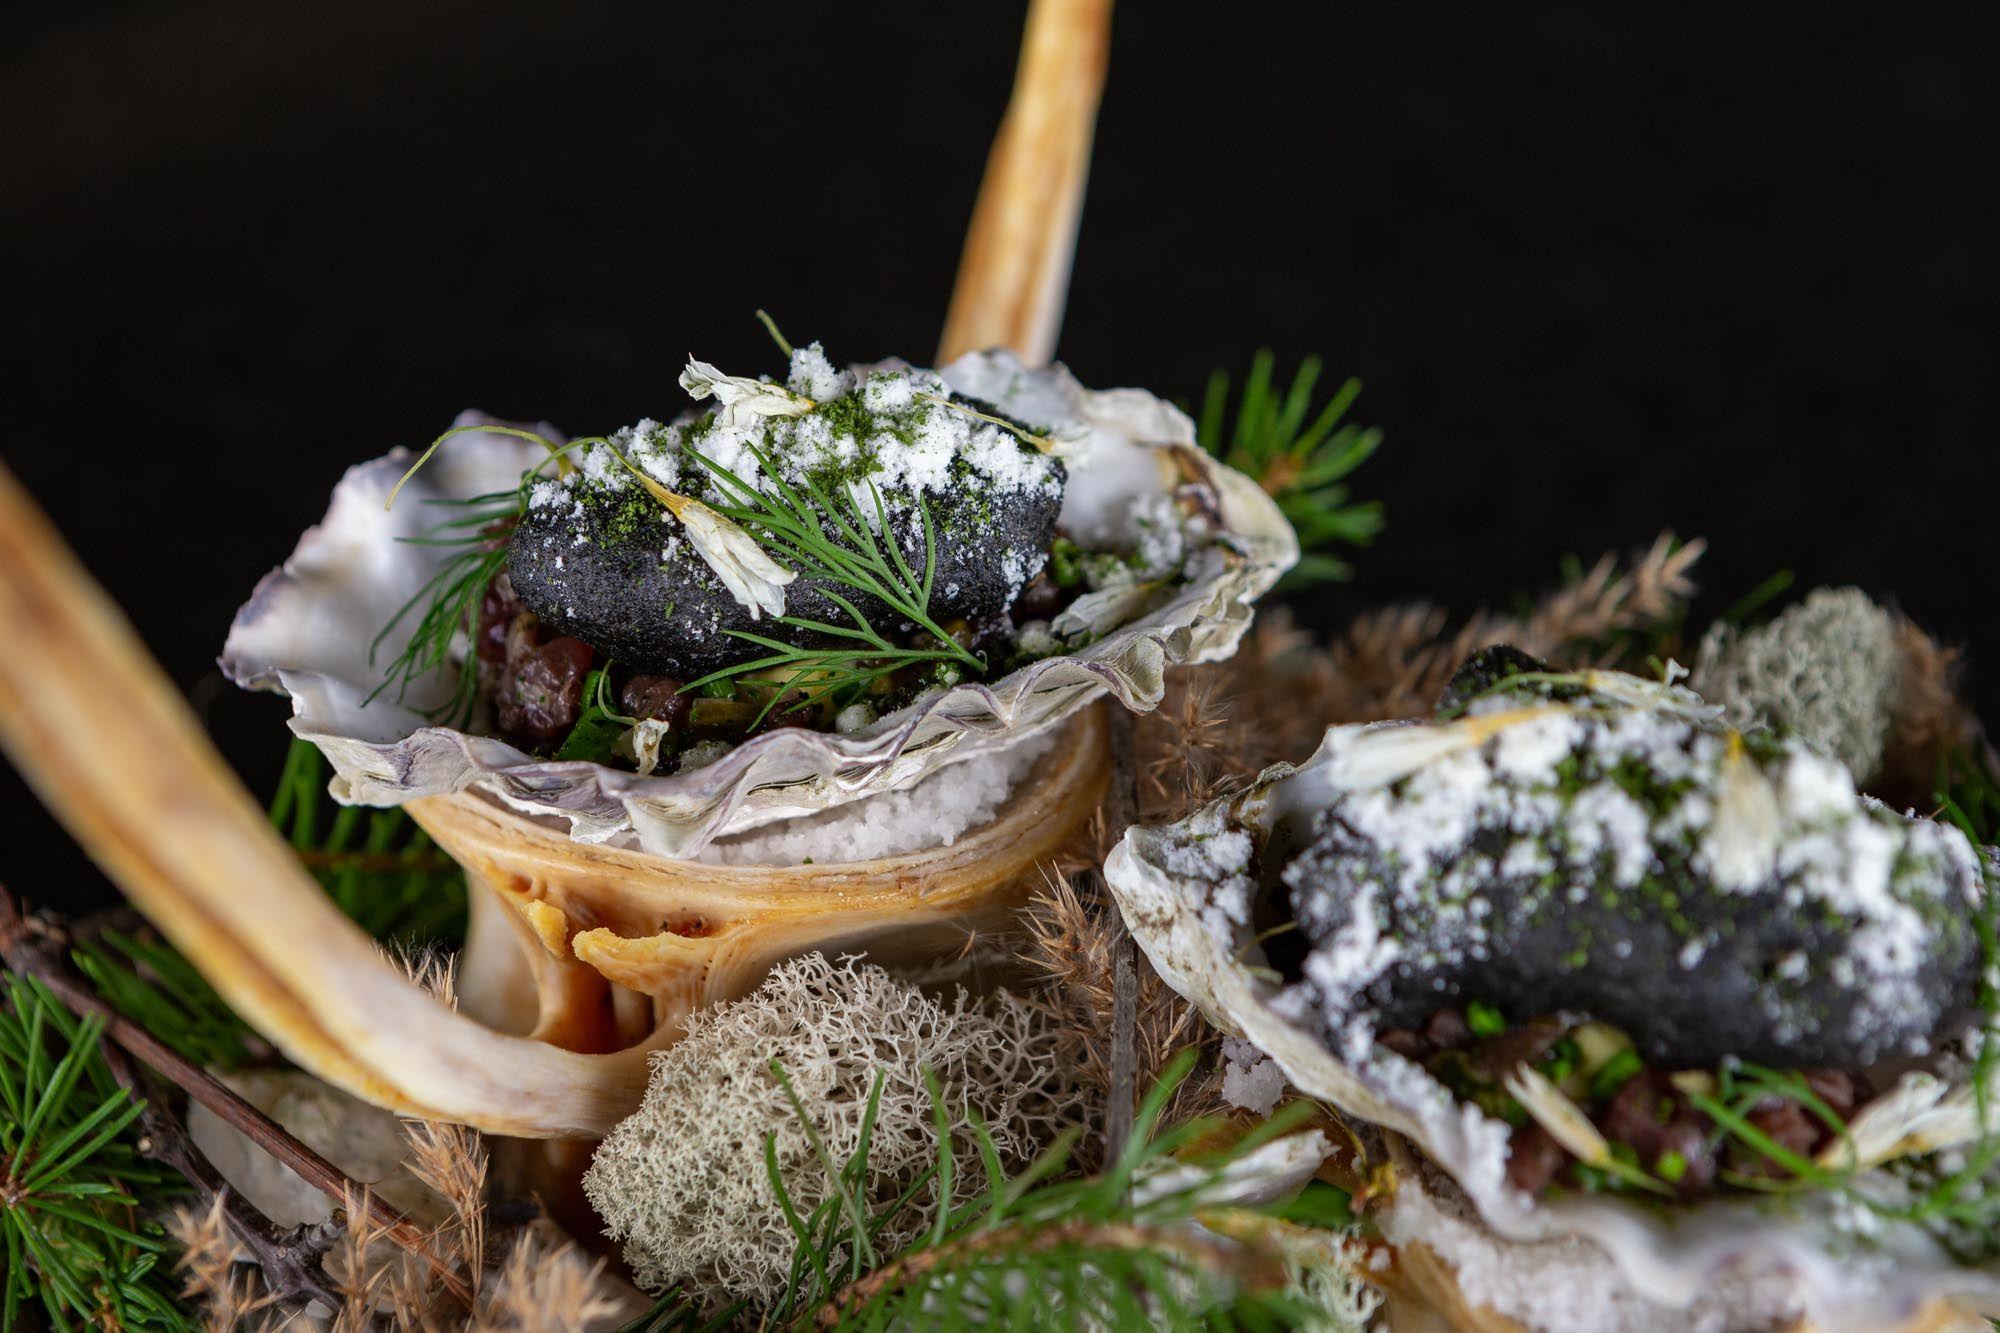 Canoe Restaurant tasting menu dish - oyster and bison tartare